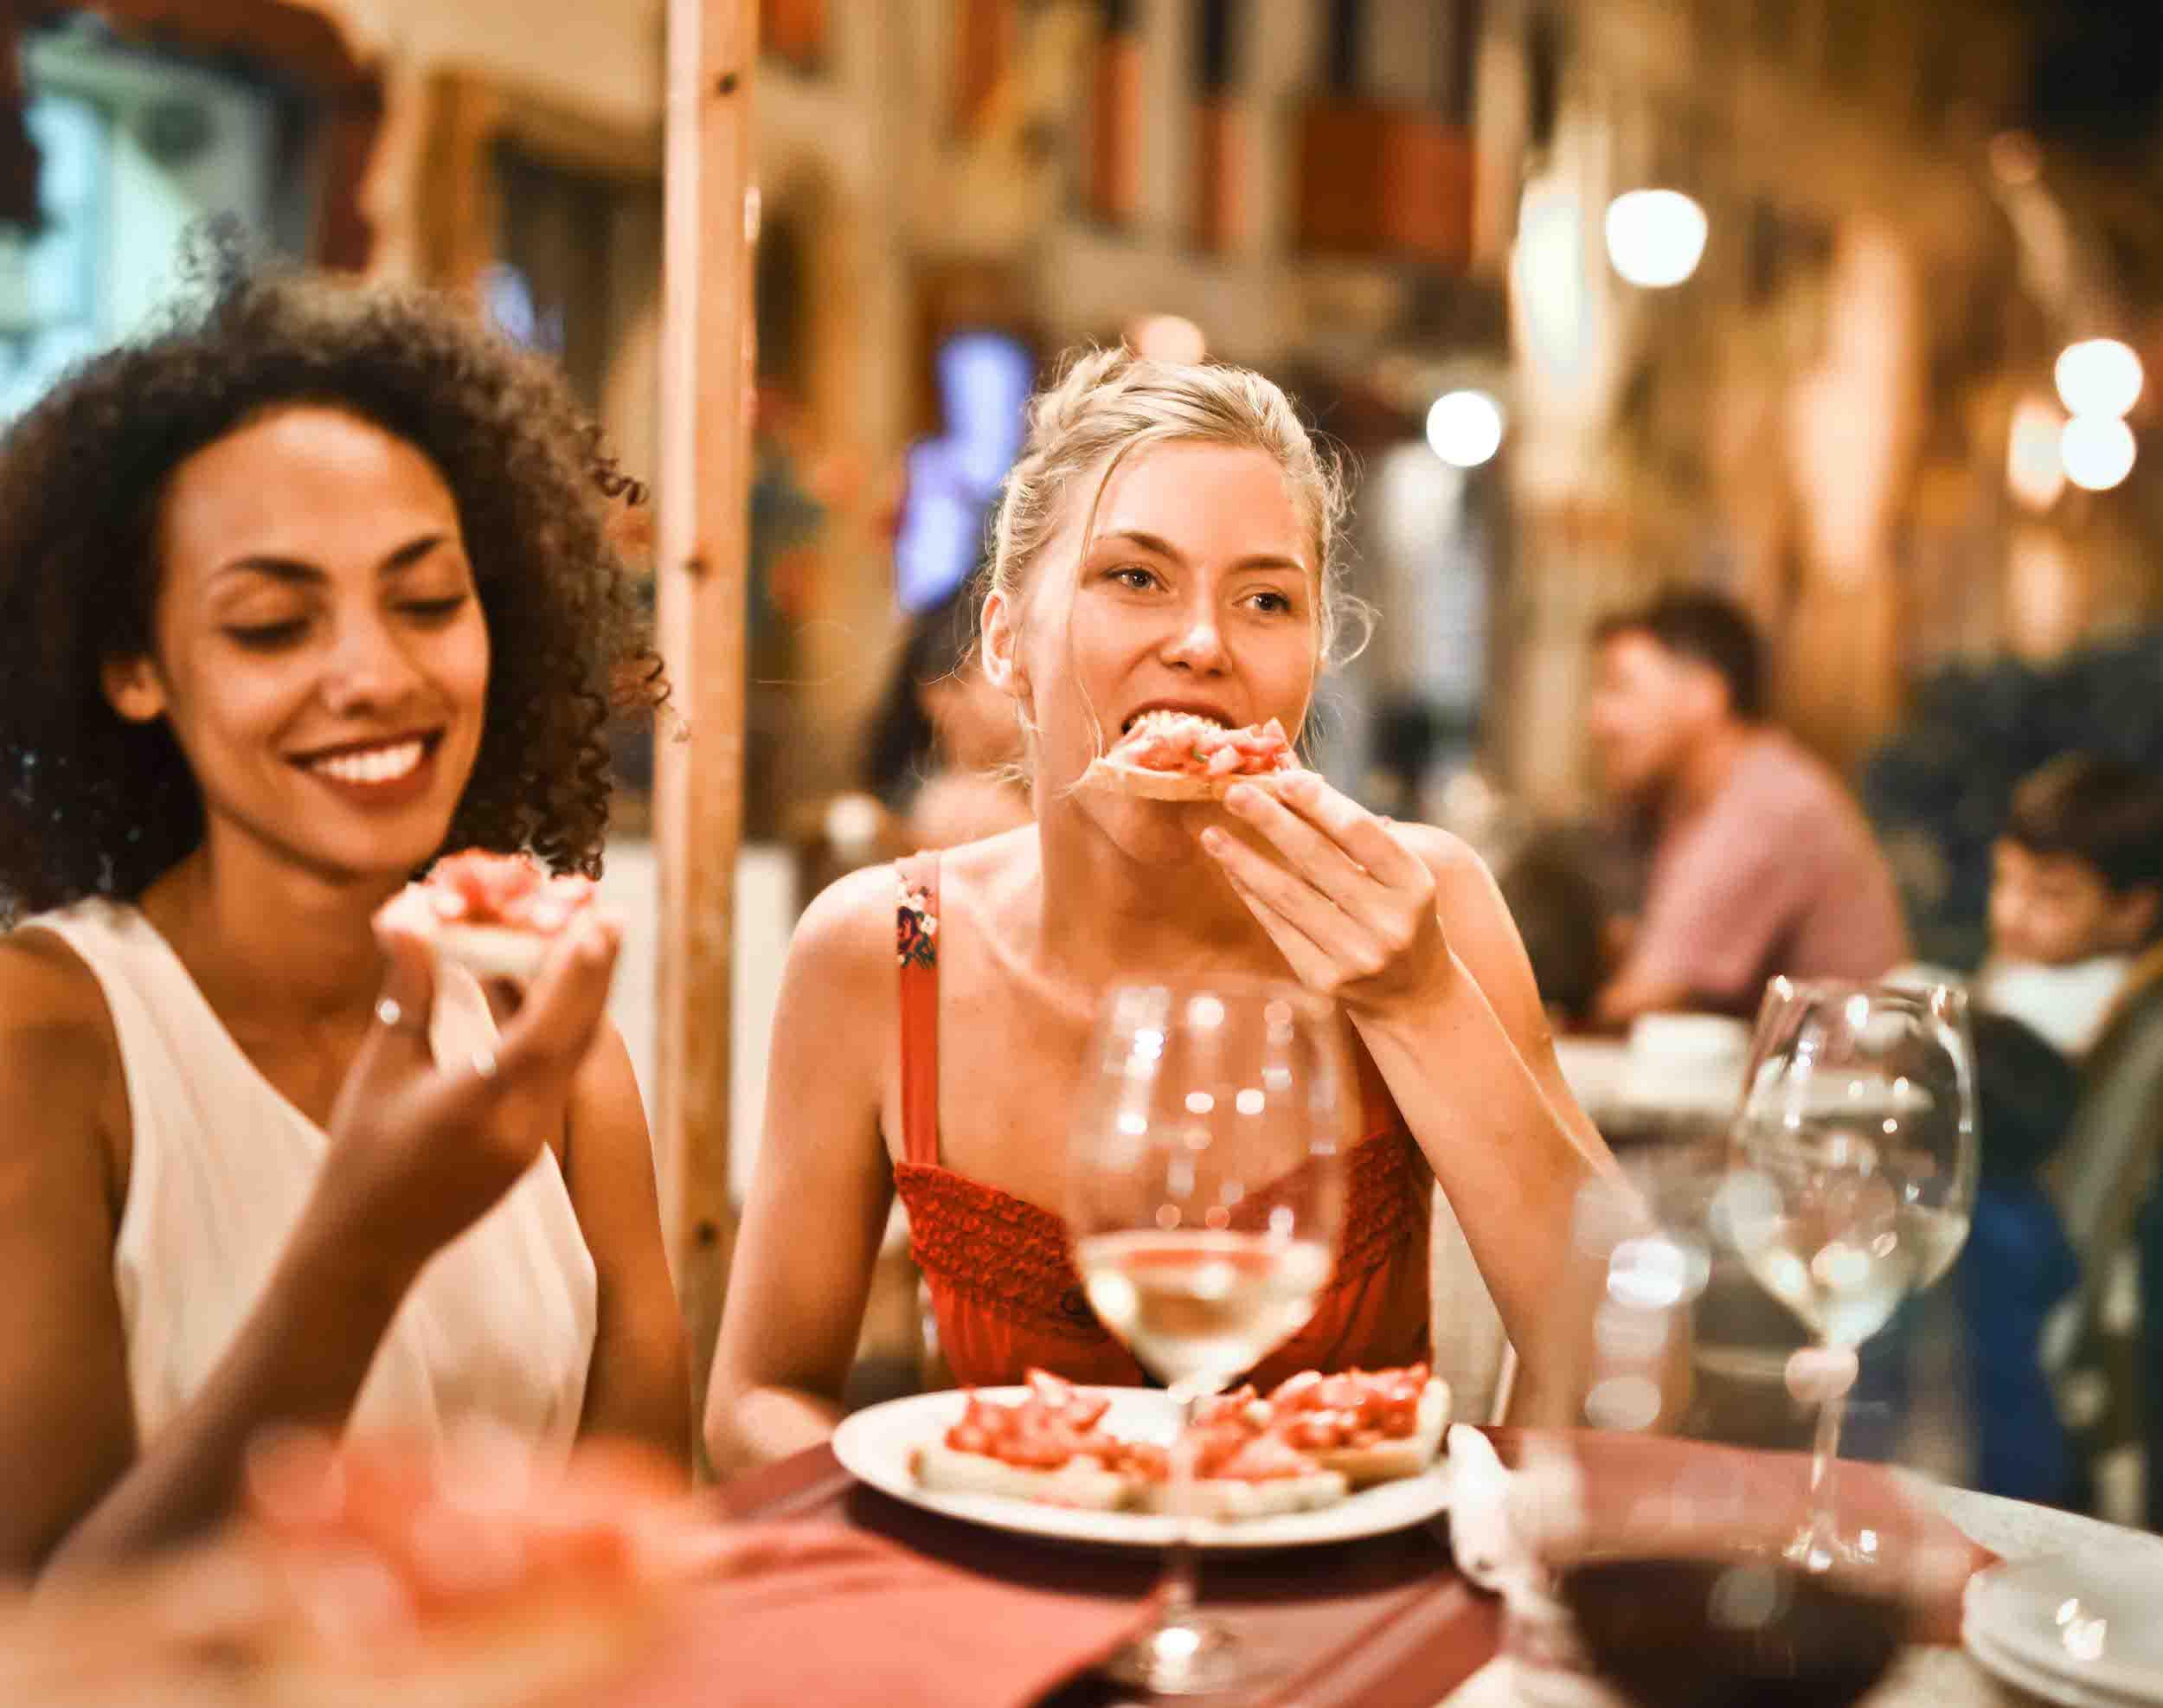 beautiful girls eating and enjoying food at restaurant